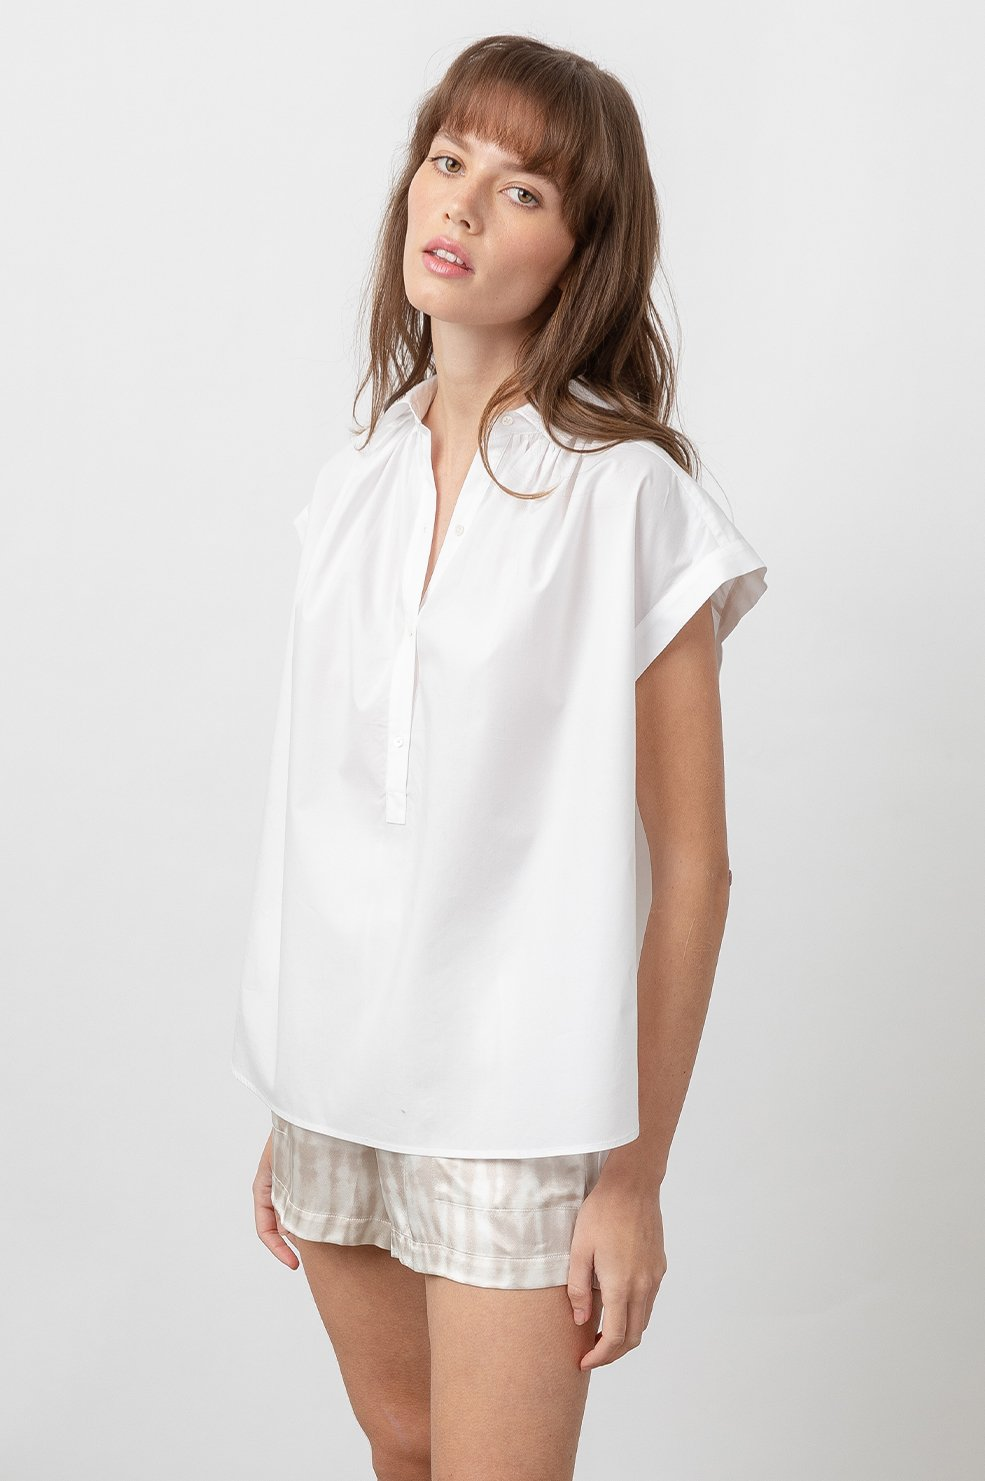 shannon-white2